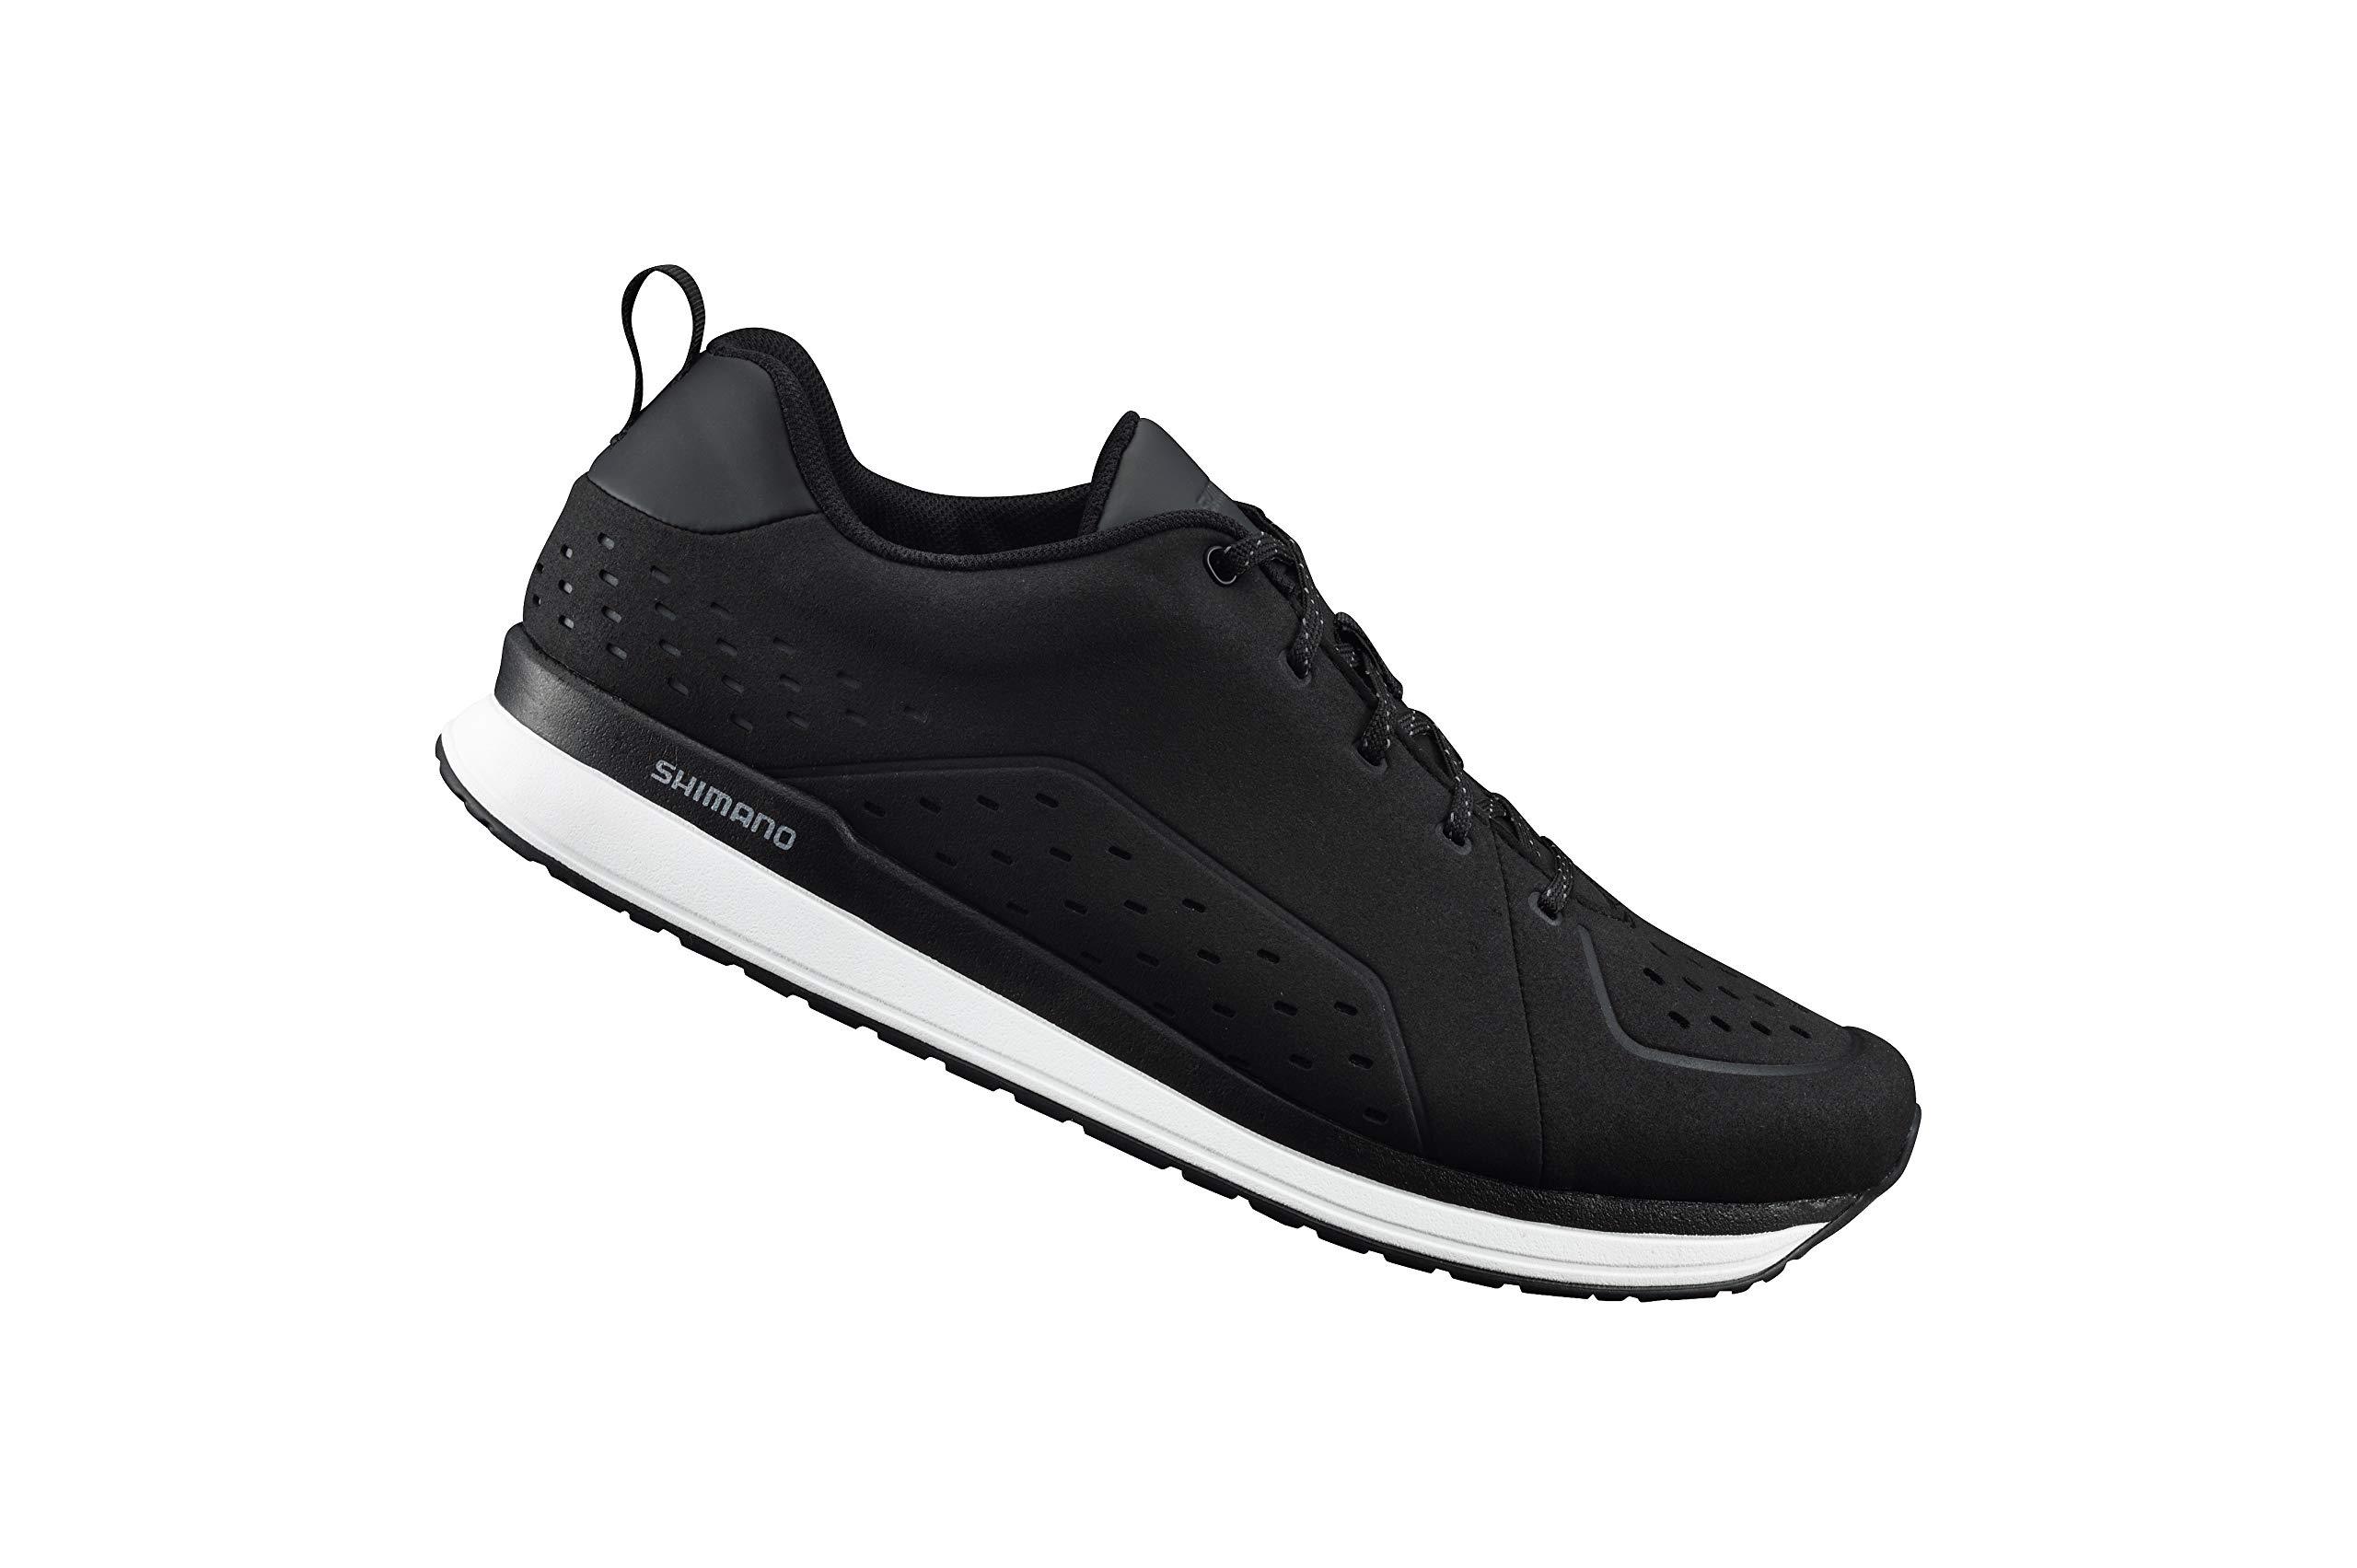 SHIMANO SH-CT5 Bicycle Shoes, Black, Size 38